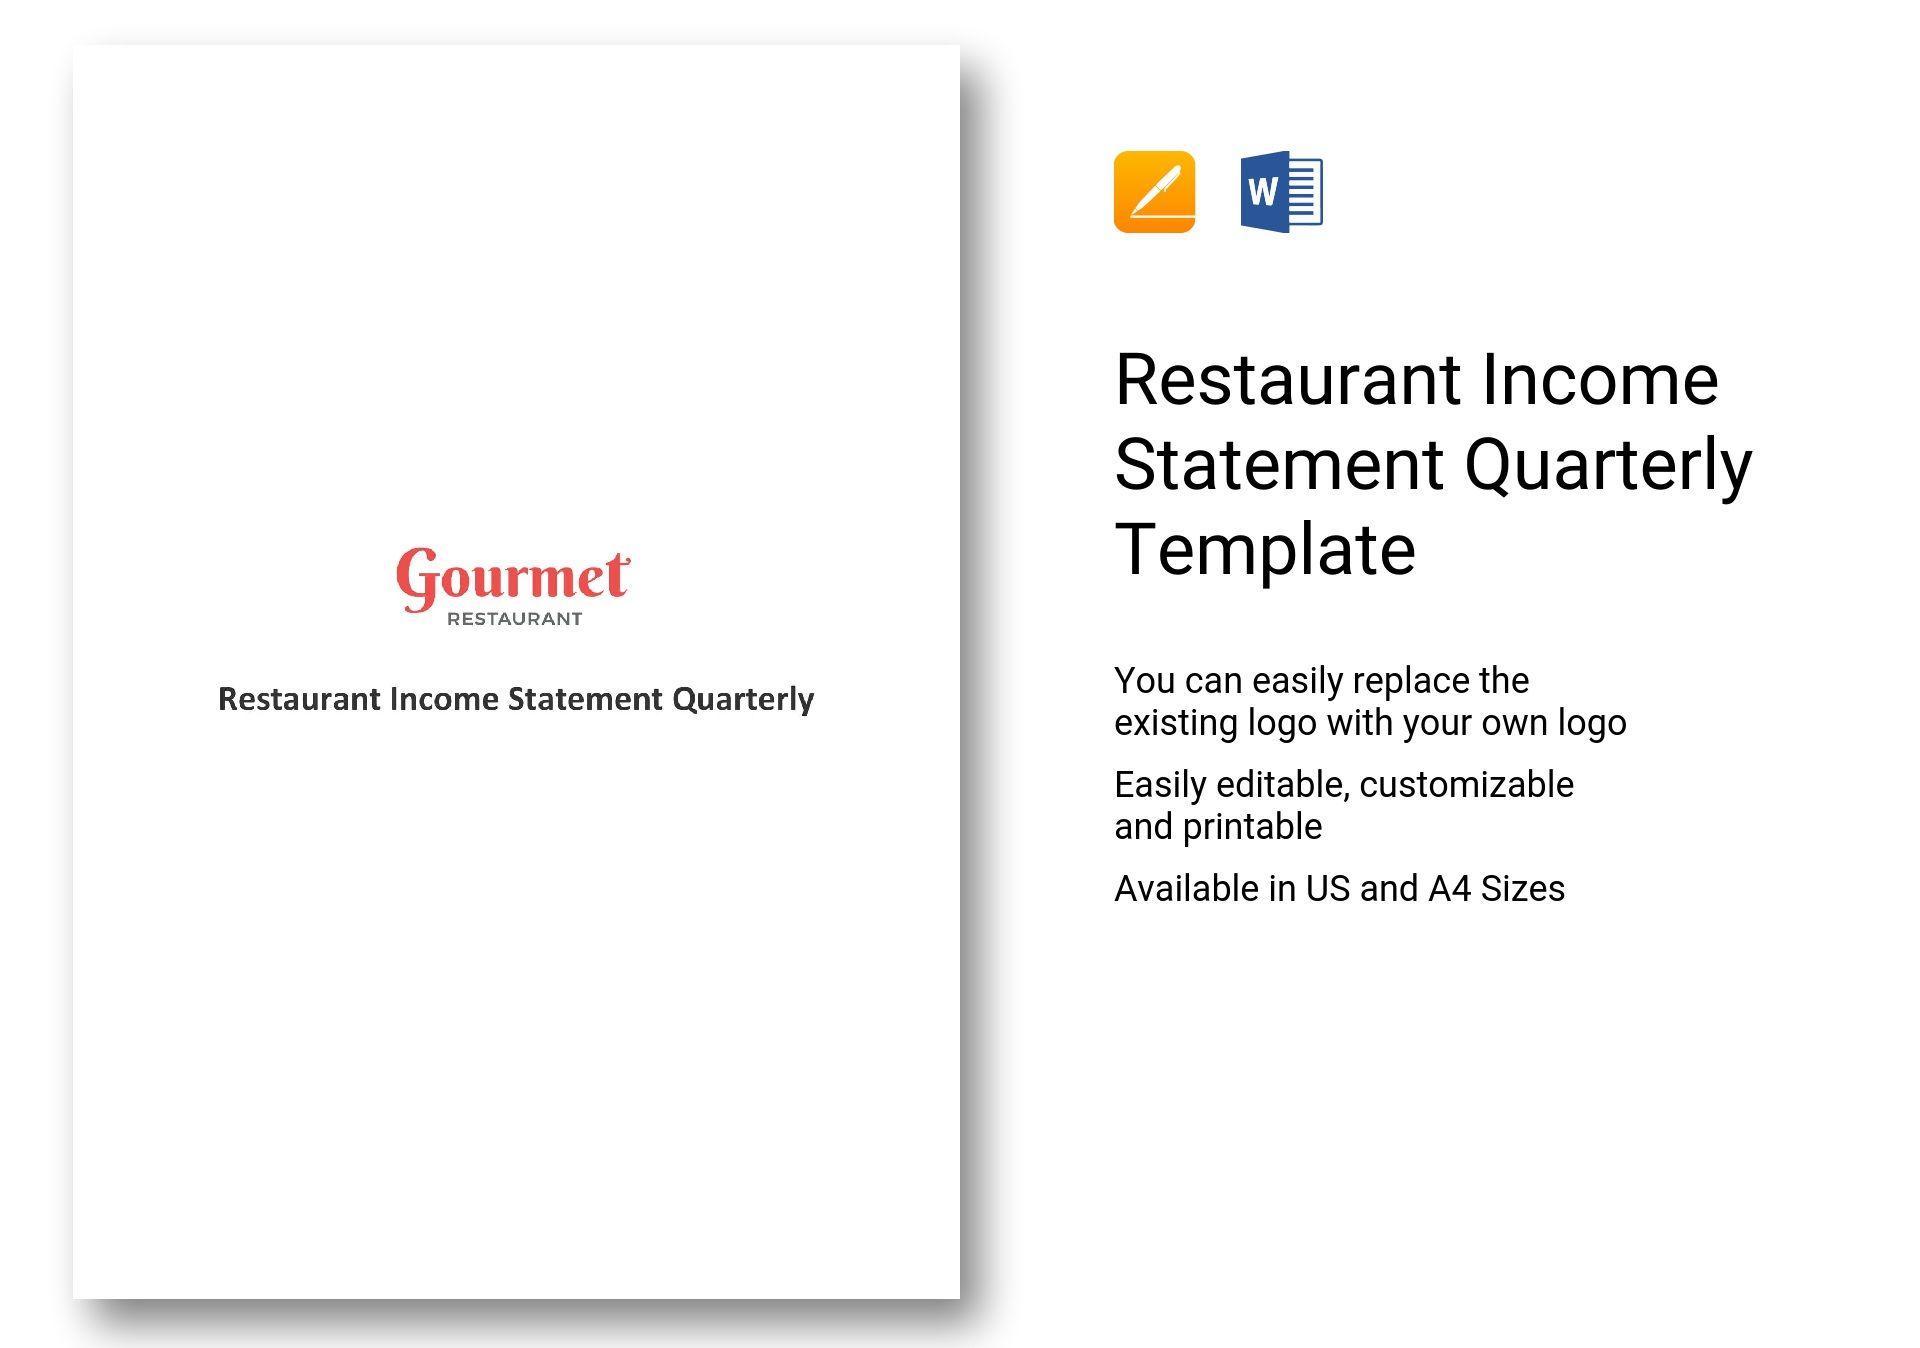 Restaurant Income Statement Quarterly